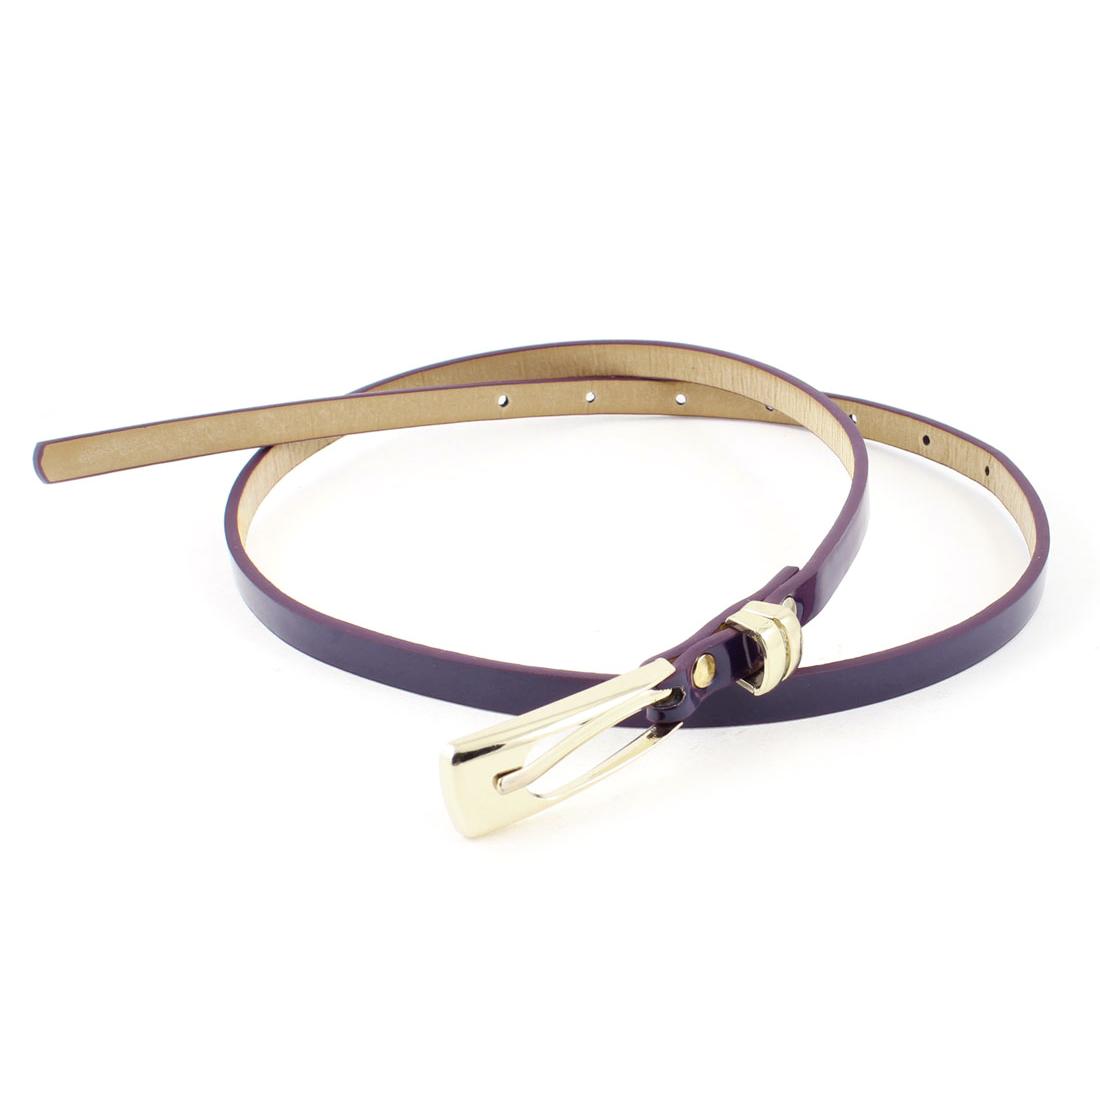 Adjustable Design Metal Single Prong Buckle Slim Belt Purple for Woman